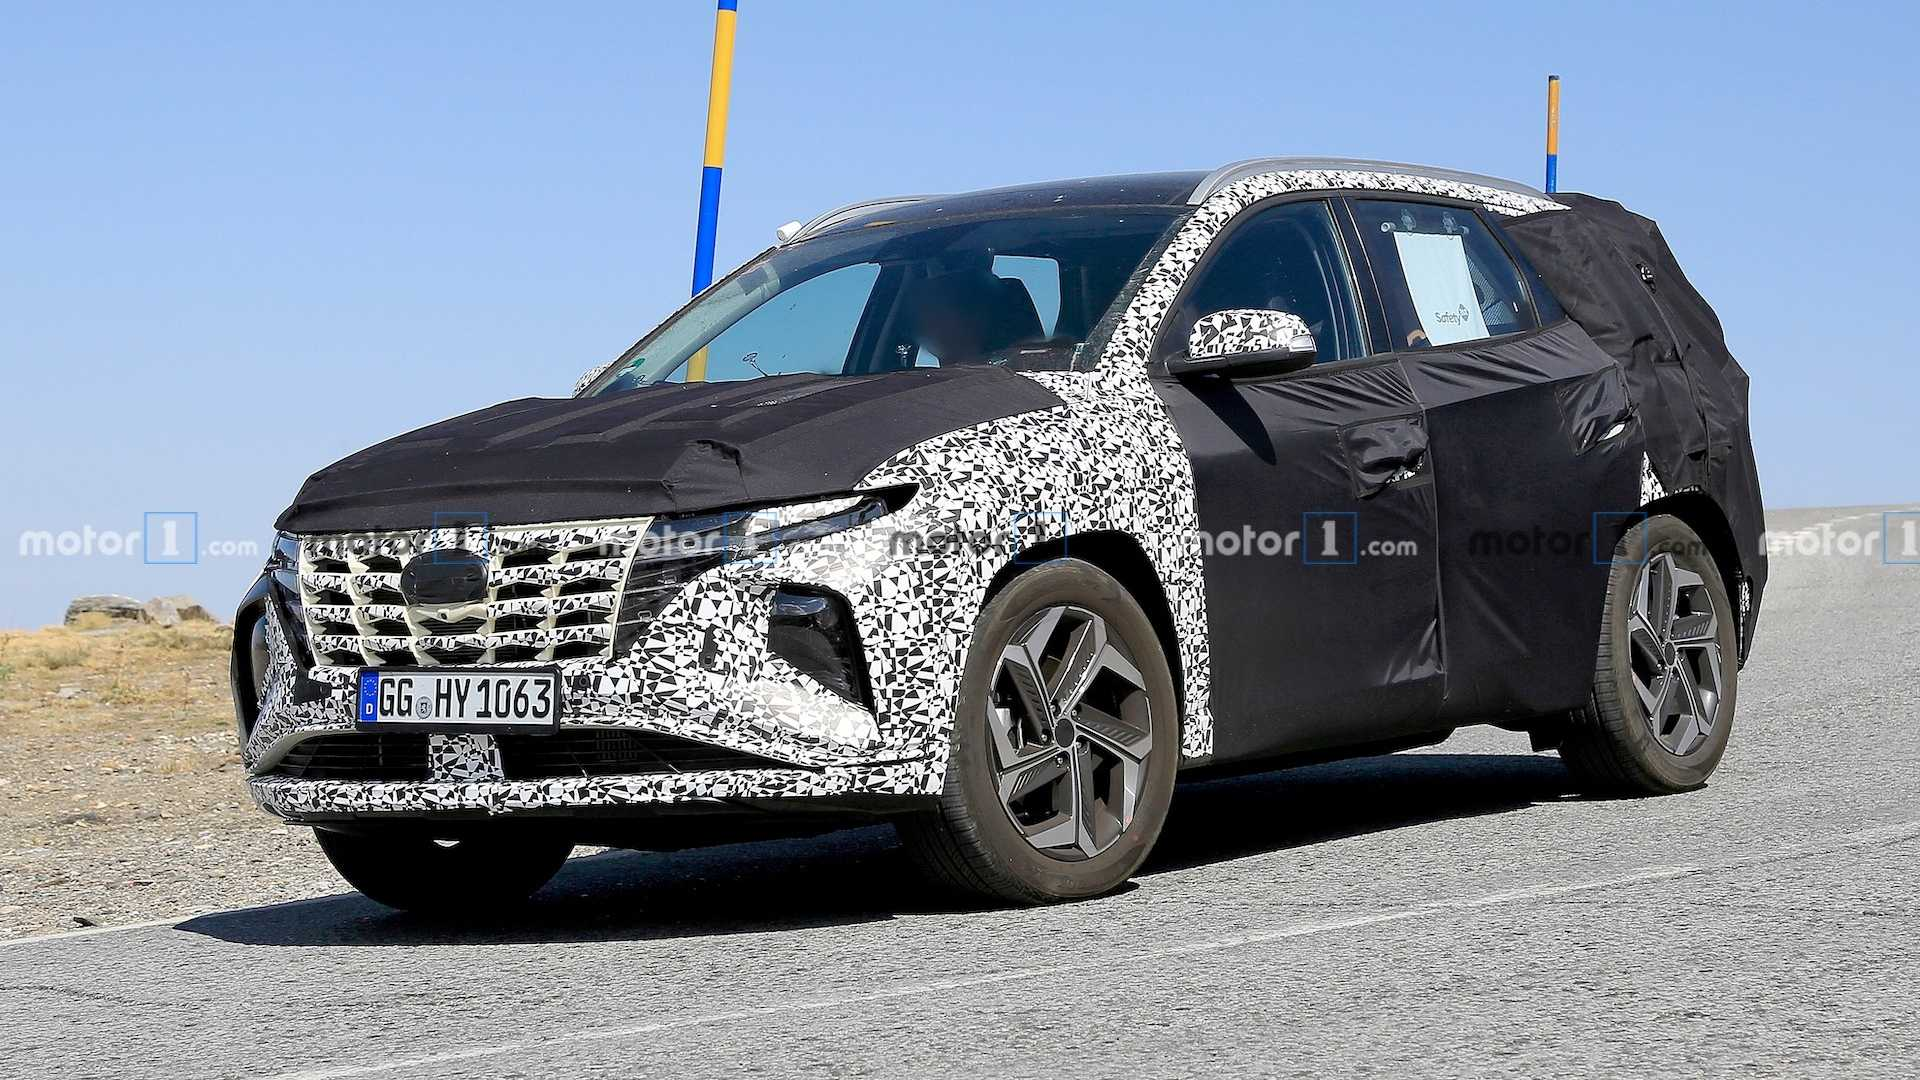 2021 Hyundai Tucson Spied Again Revealing More Details